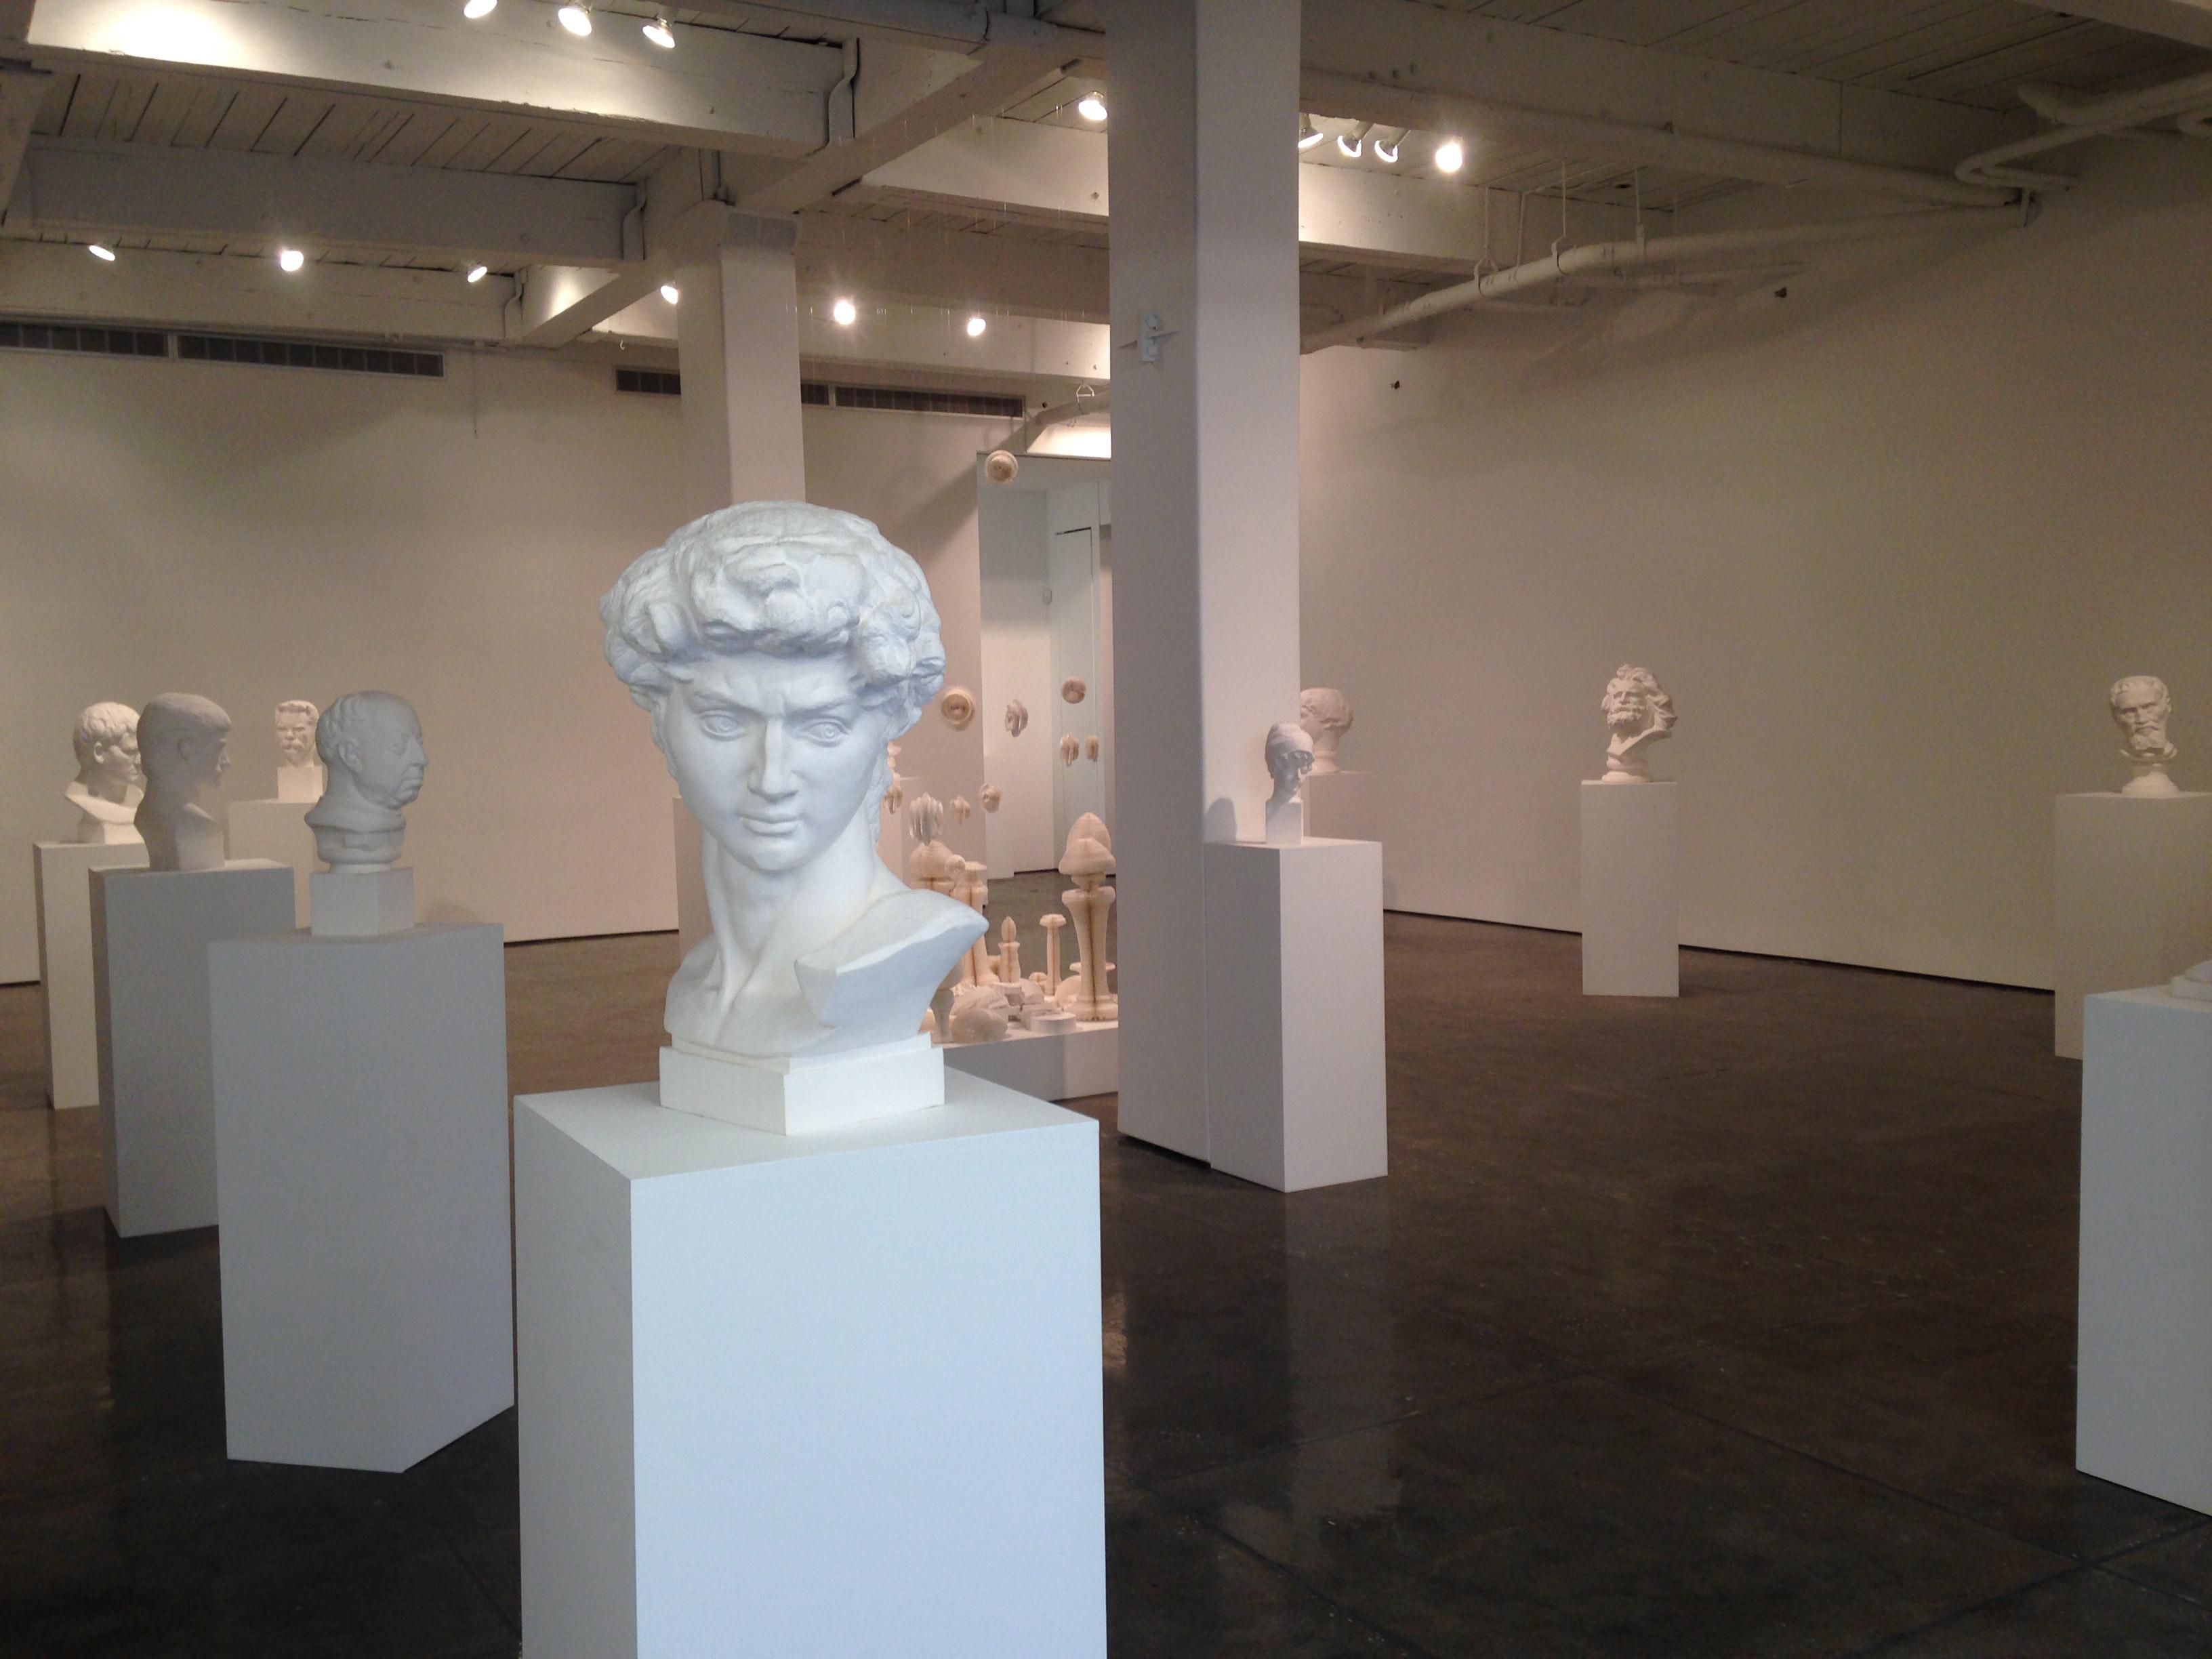 paper-sculptures-li-hongbo-21